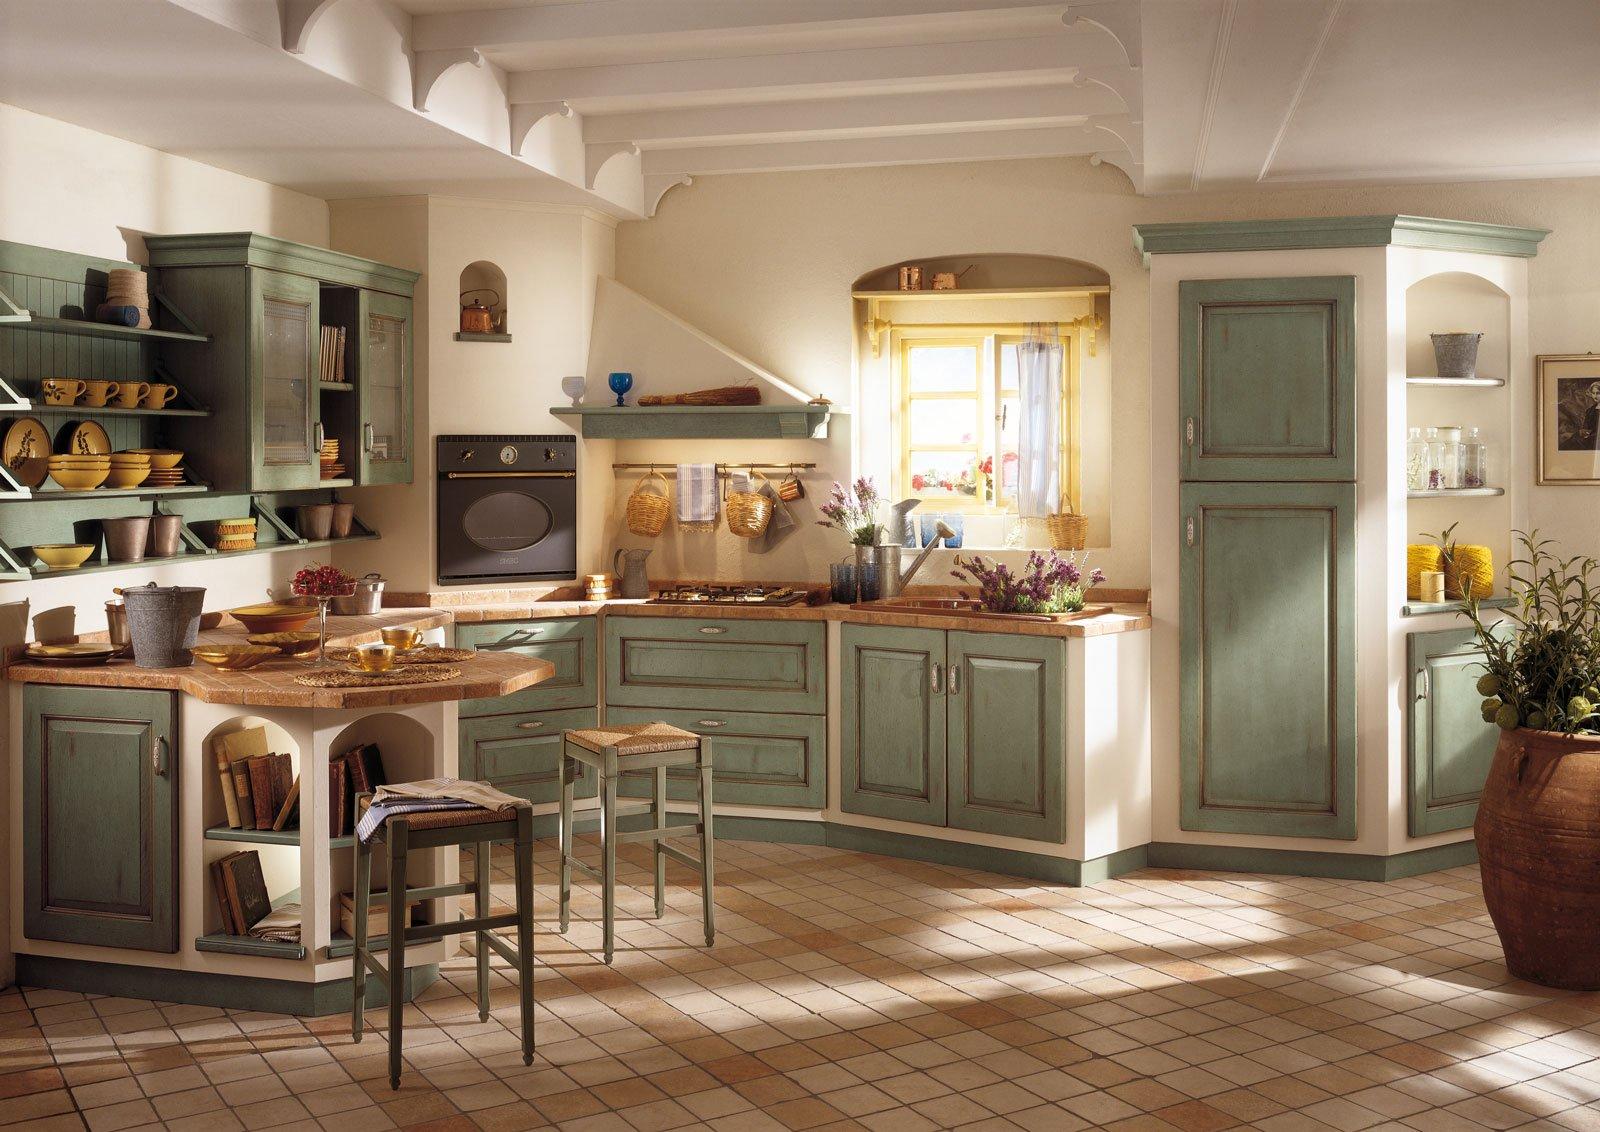 Cucine effetto muratura vera o finta cose di casa - Cucine rustiche foto ...